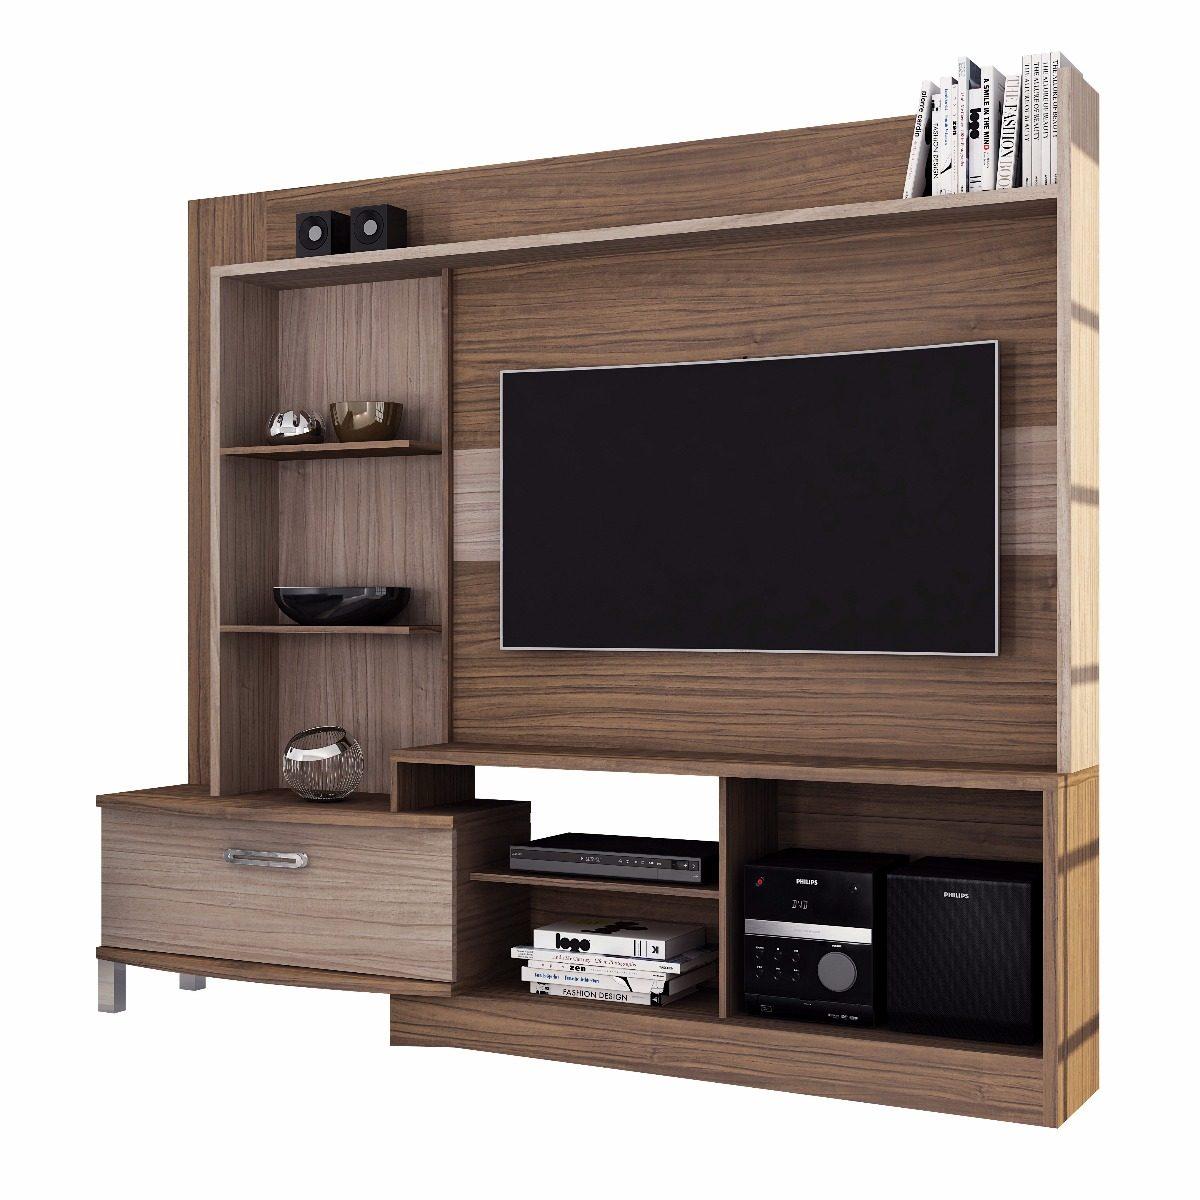 Mueble Rack Tv Home Lavinia Malbec Riviera Mueble 149 990  # Muebles Riviera